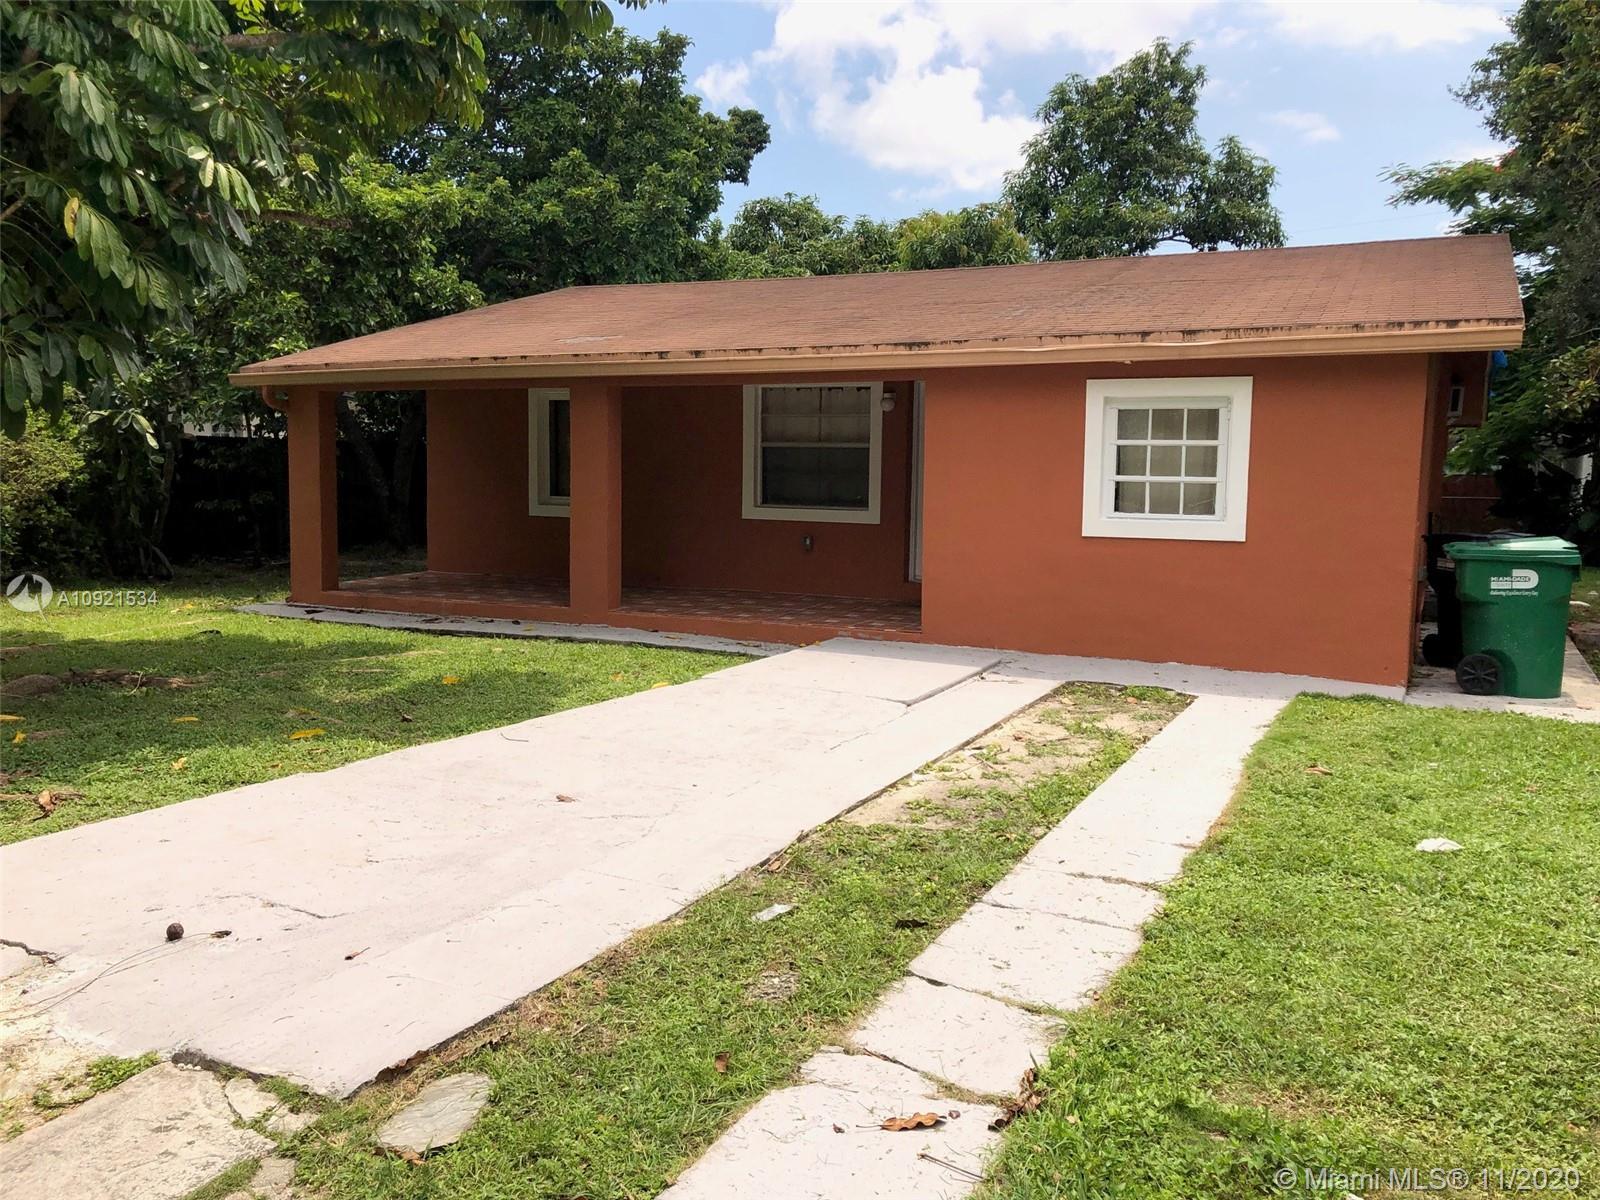 South Miami - 5920 SW 59 ST, South Miami, FL 33143